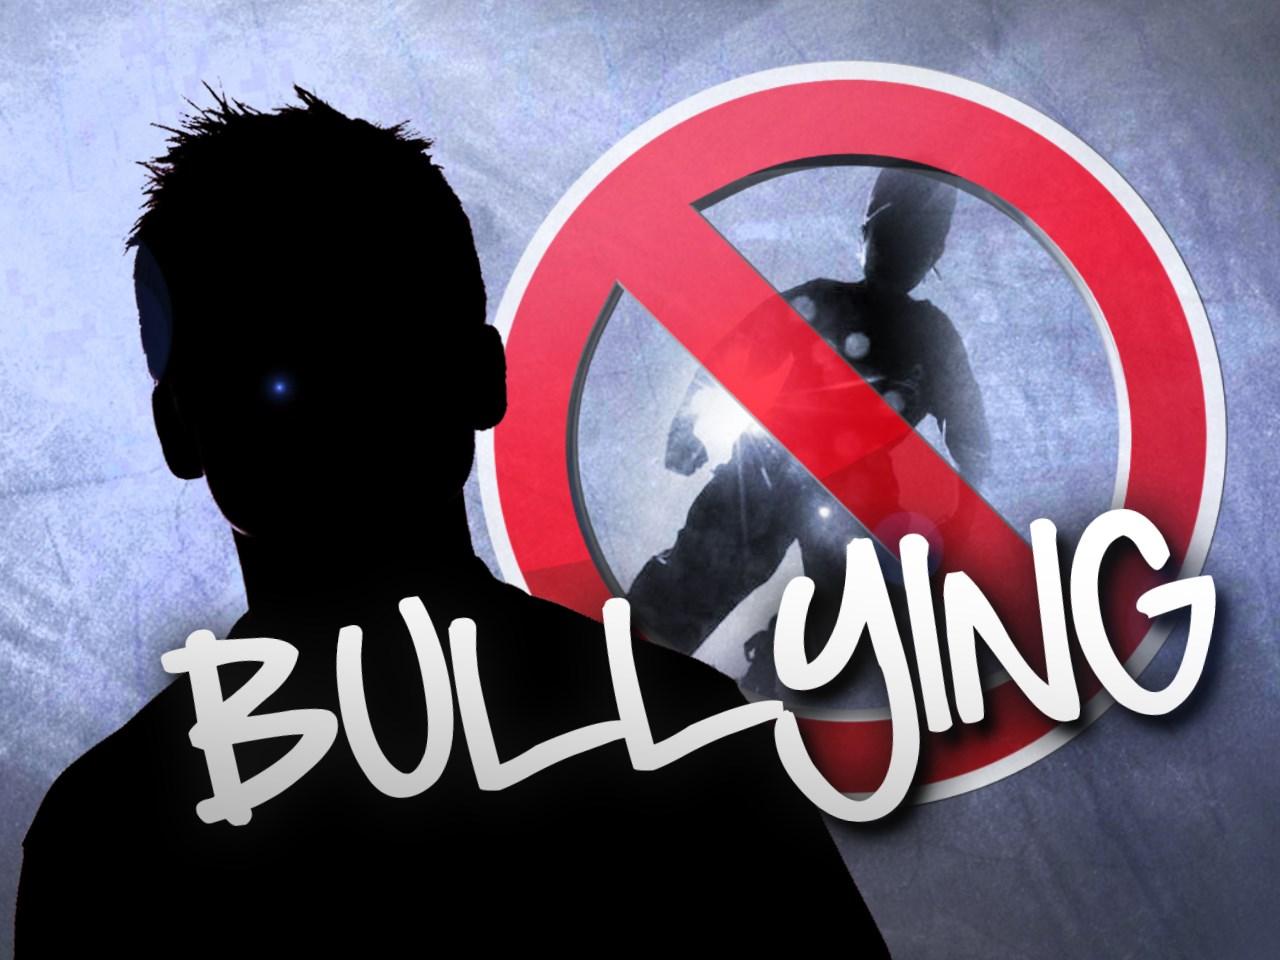 bullying_1486073805645.jpg